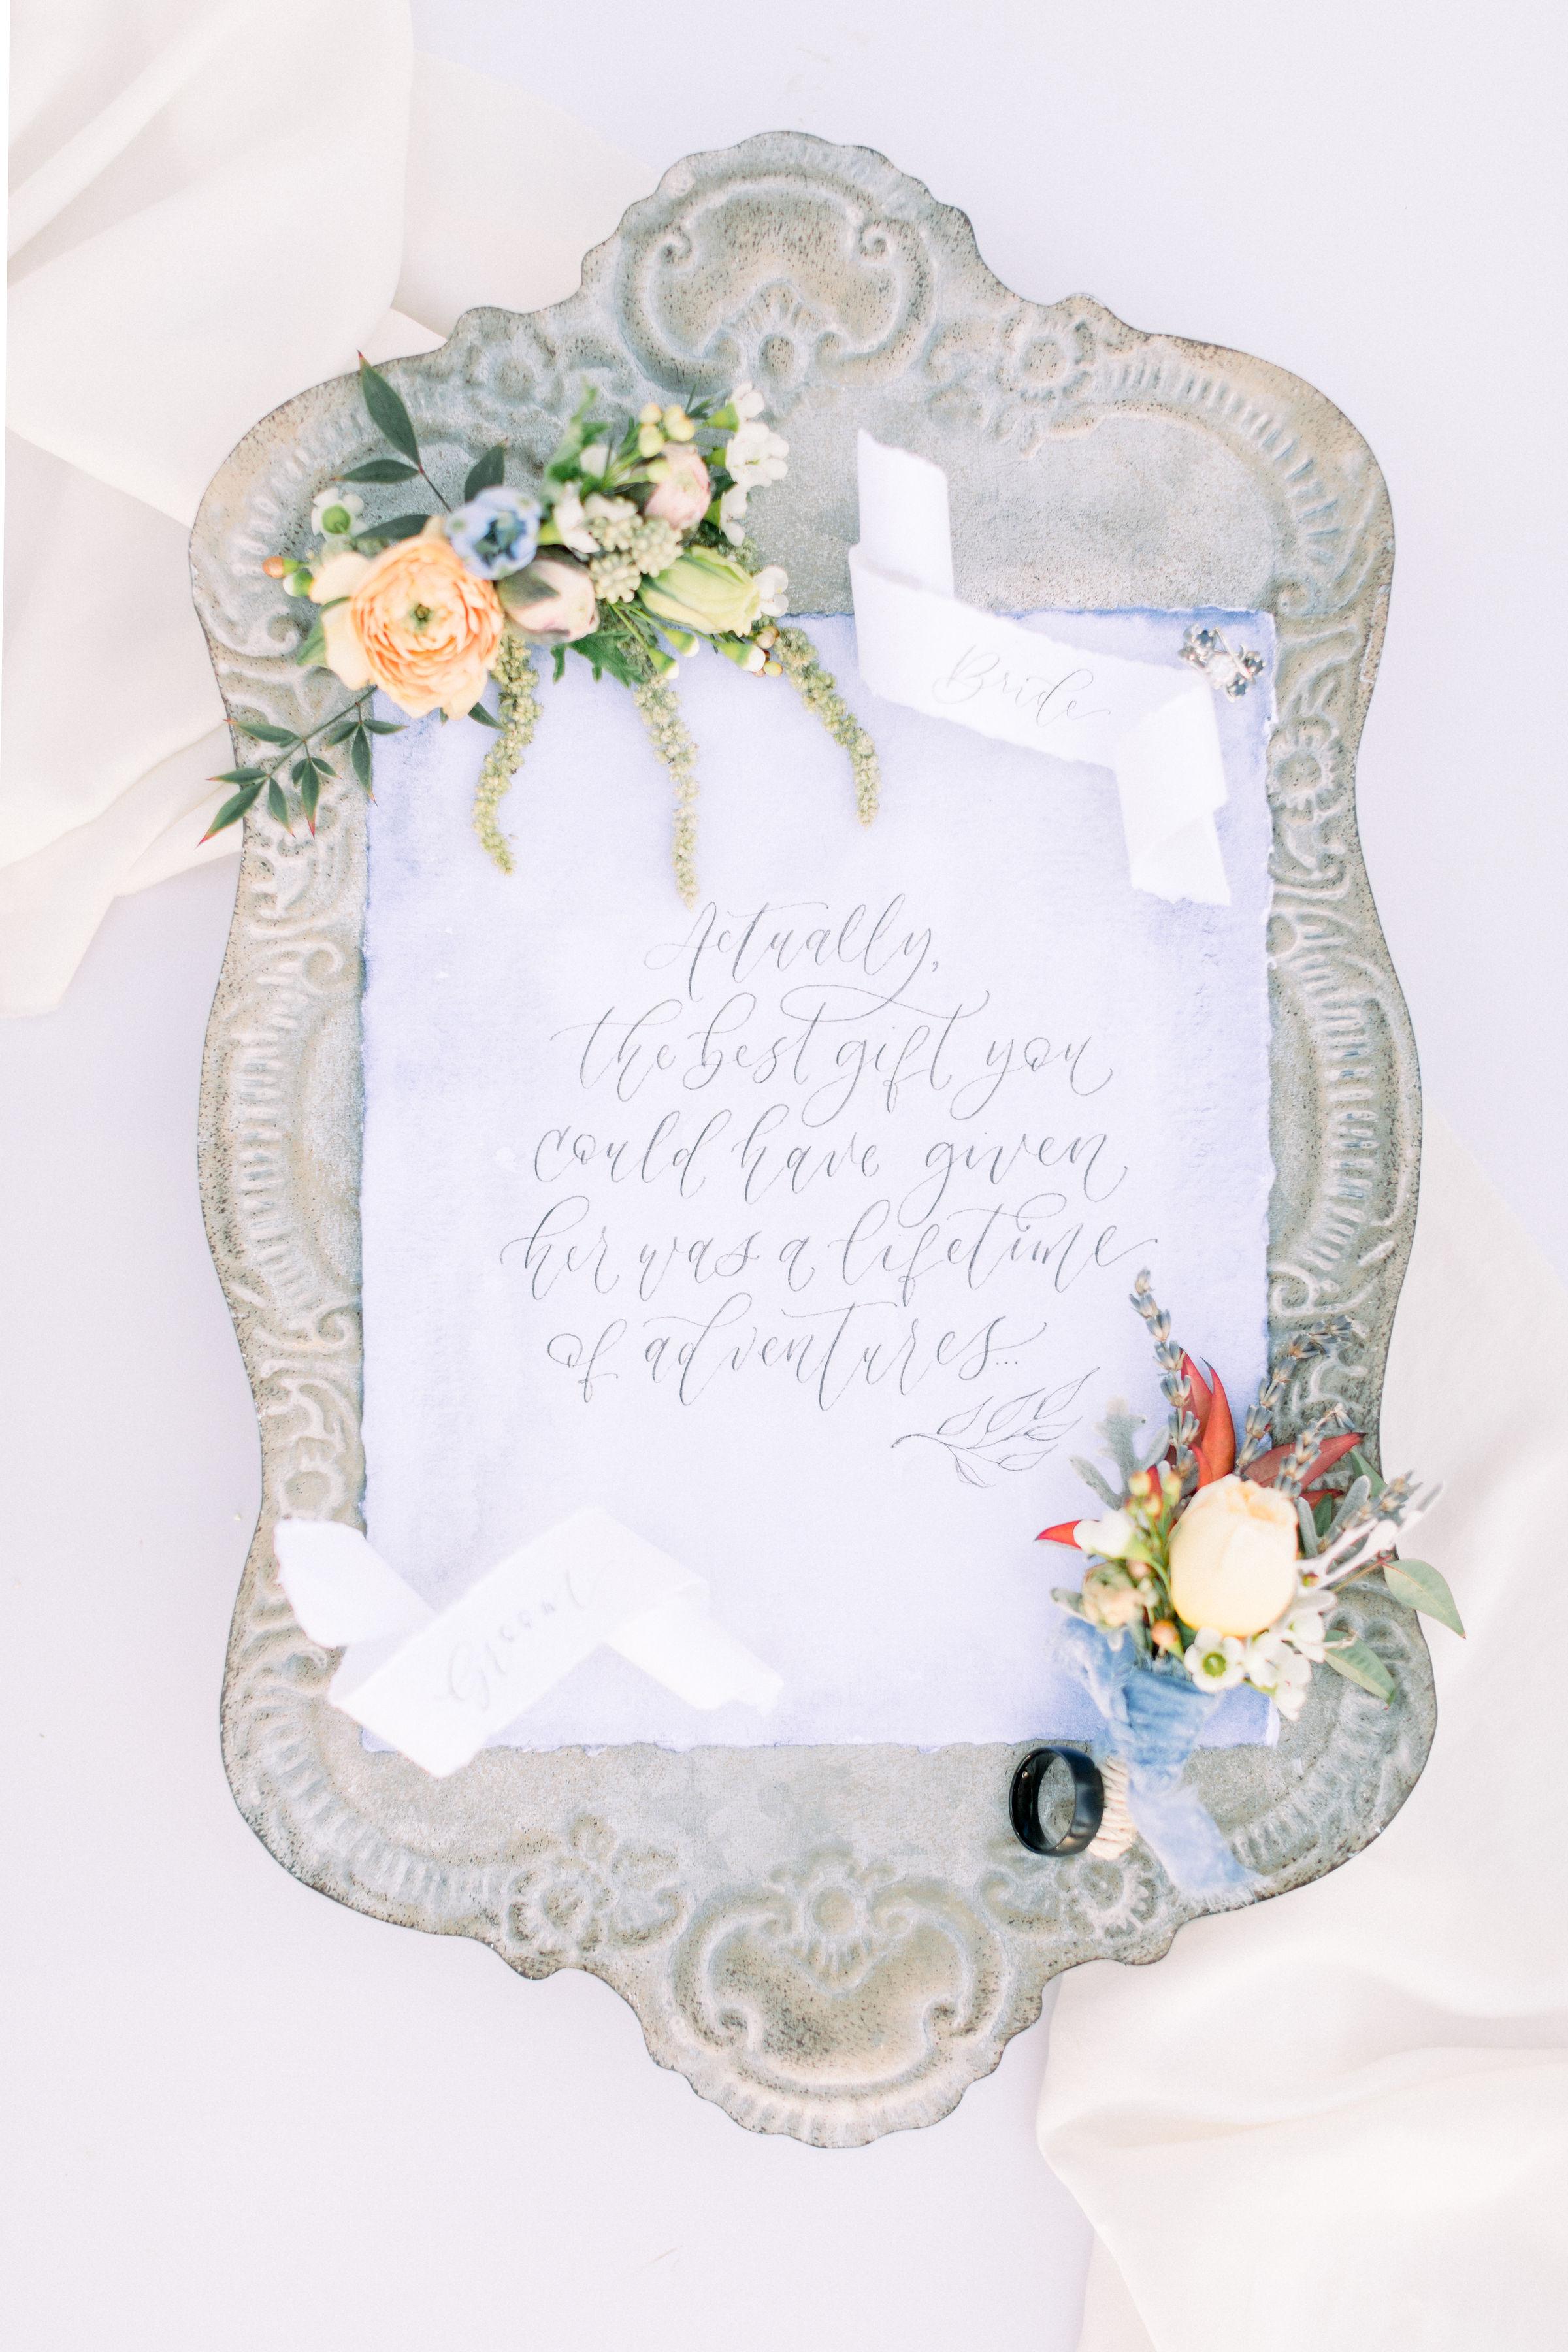 StephanieWeberPhotography-Alice-in-Wonderland-wedding-vow-keepsake-quote